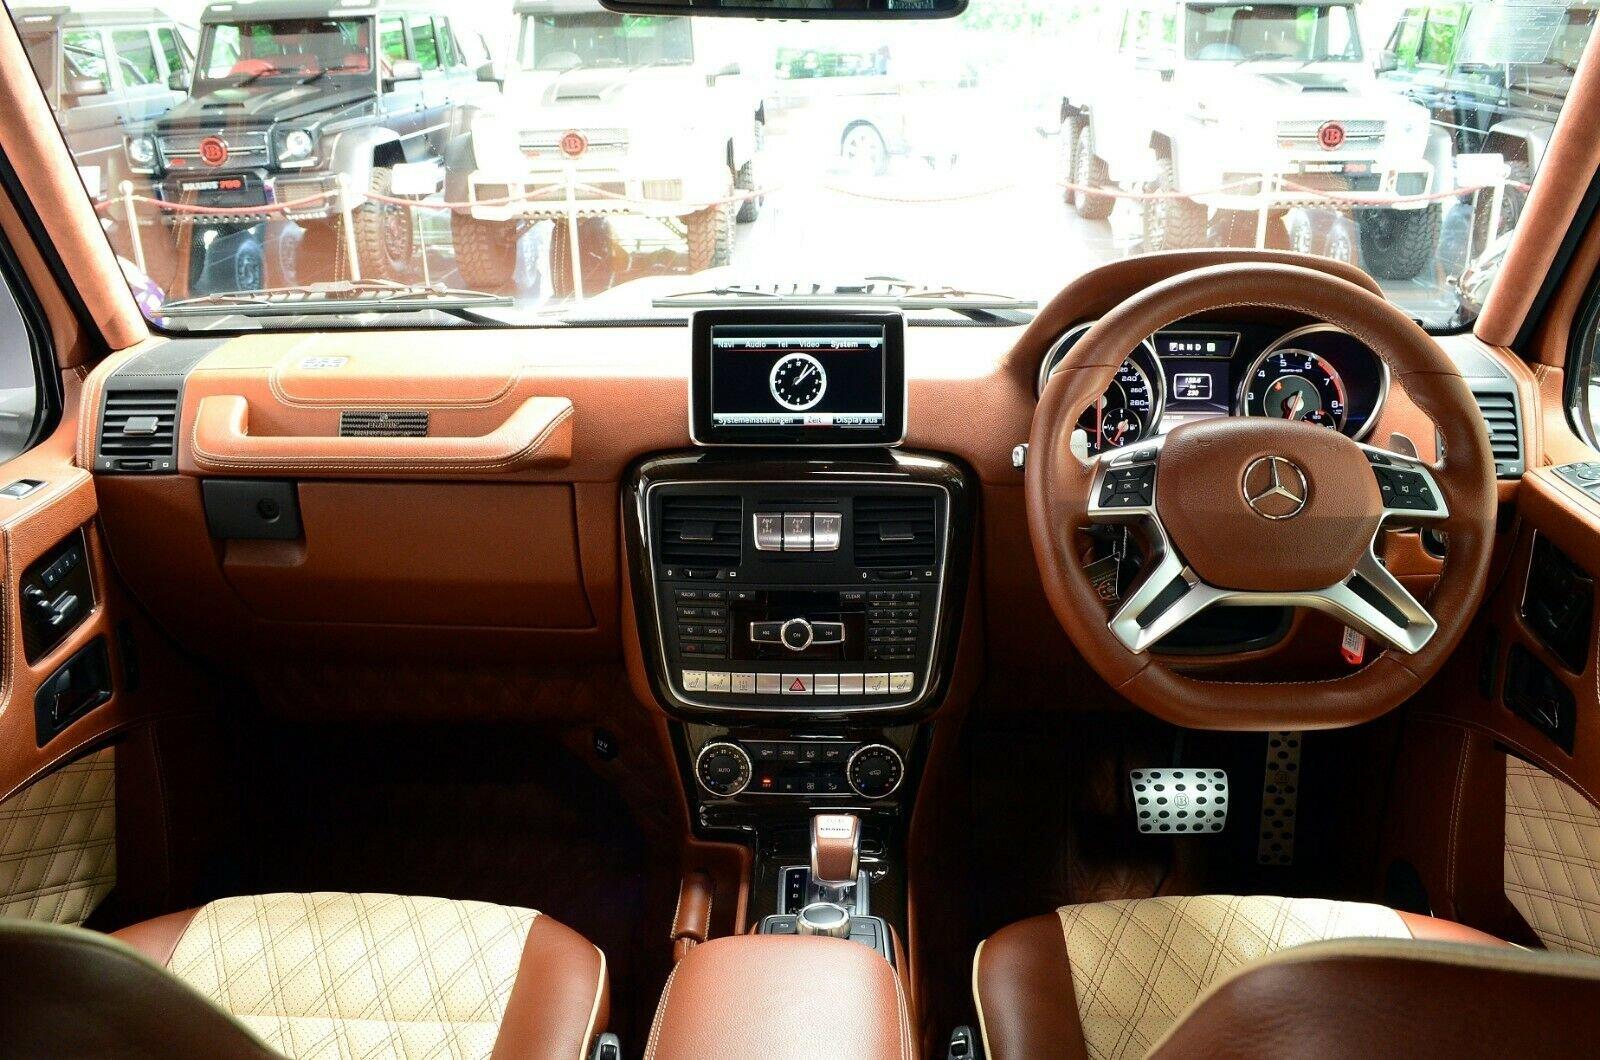 Mercedes-Benz G 63 AMG 6x6 Brabus700 - 1of15 (13)